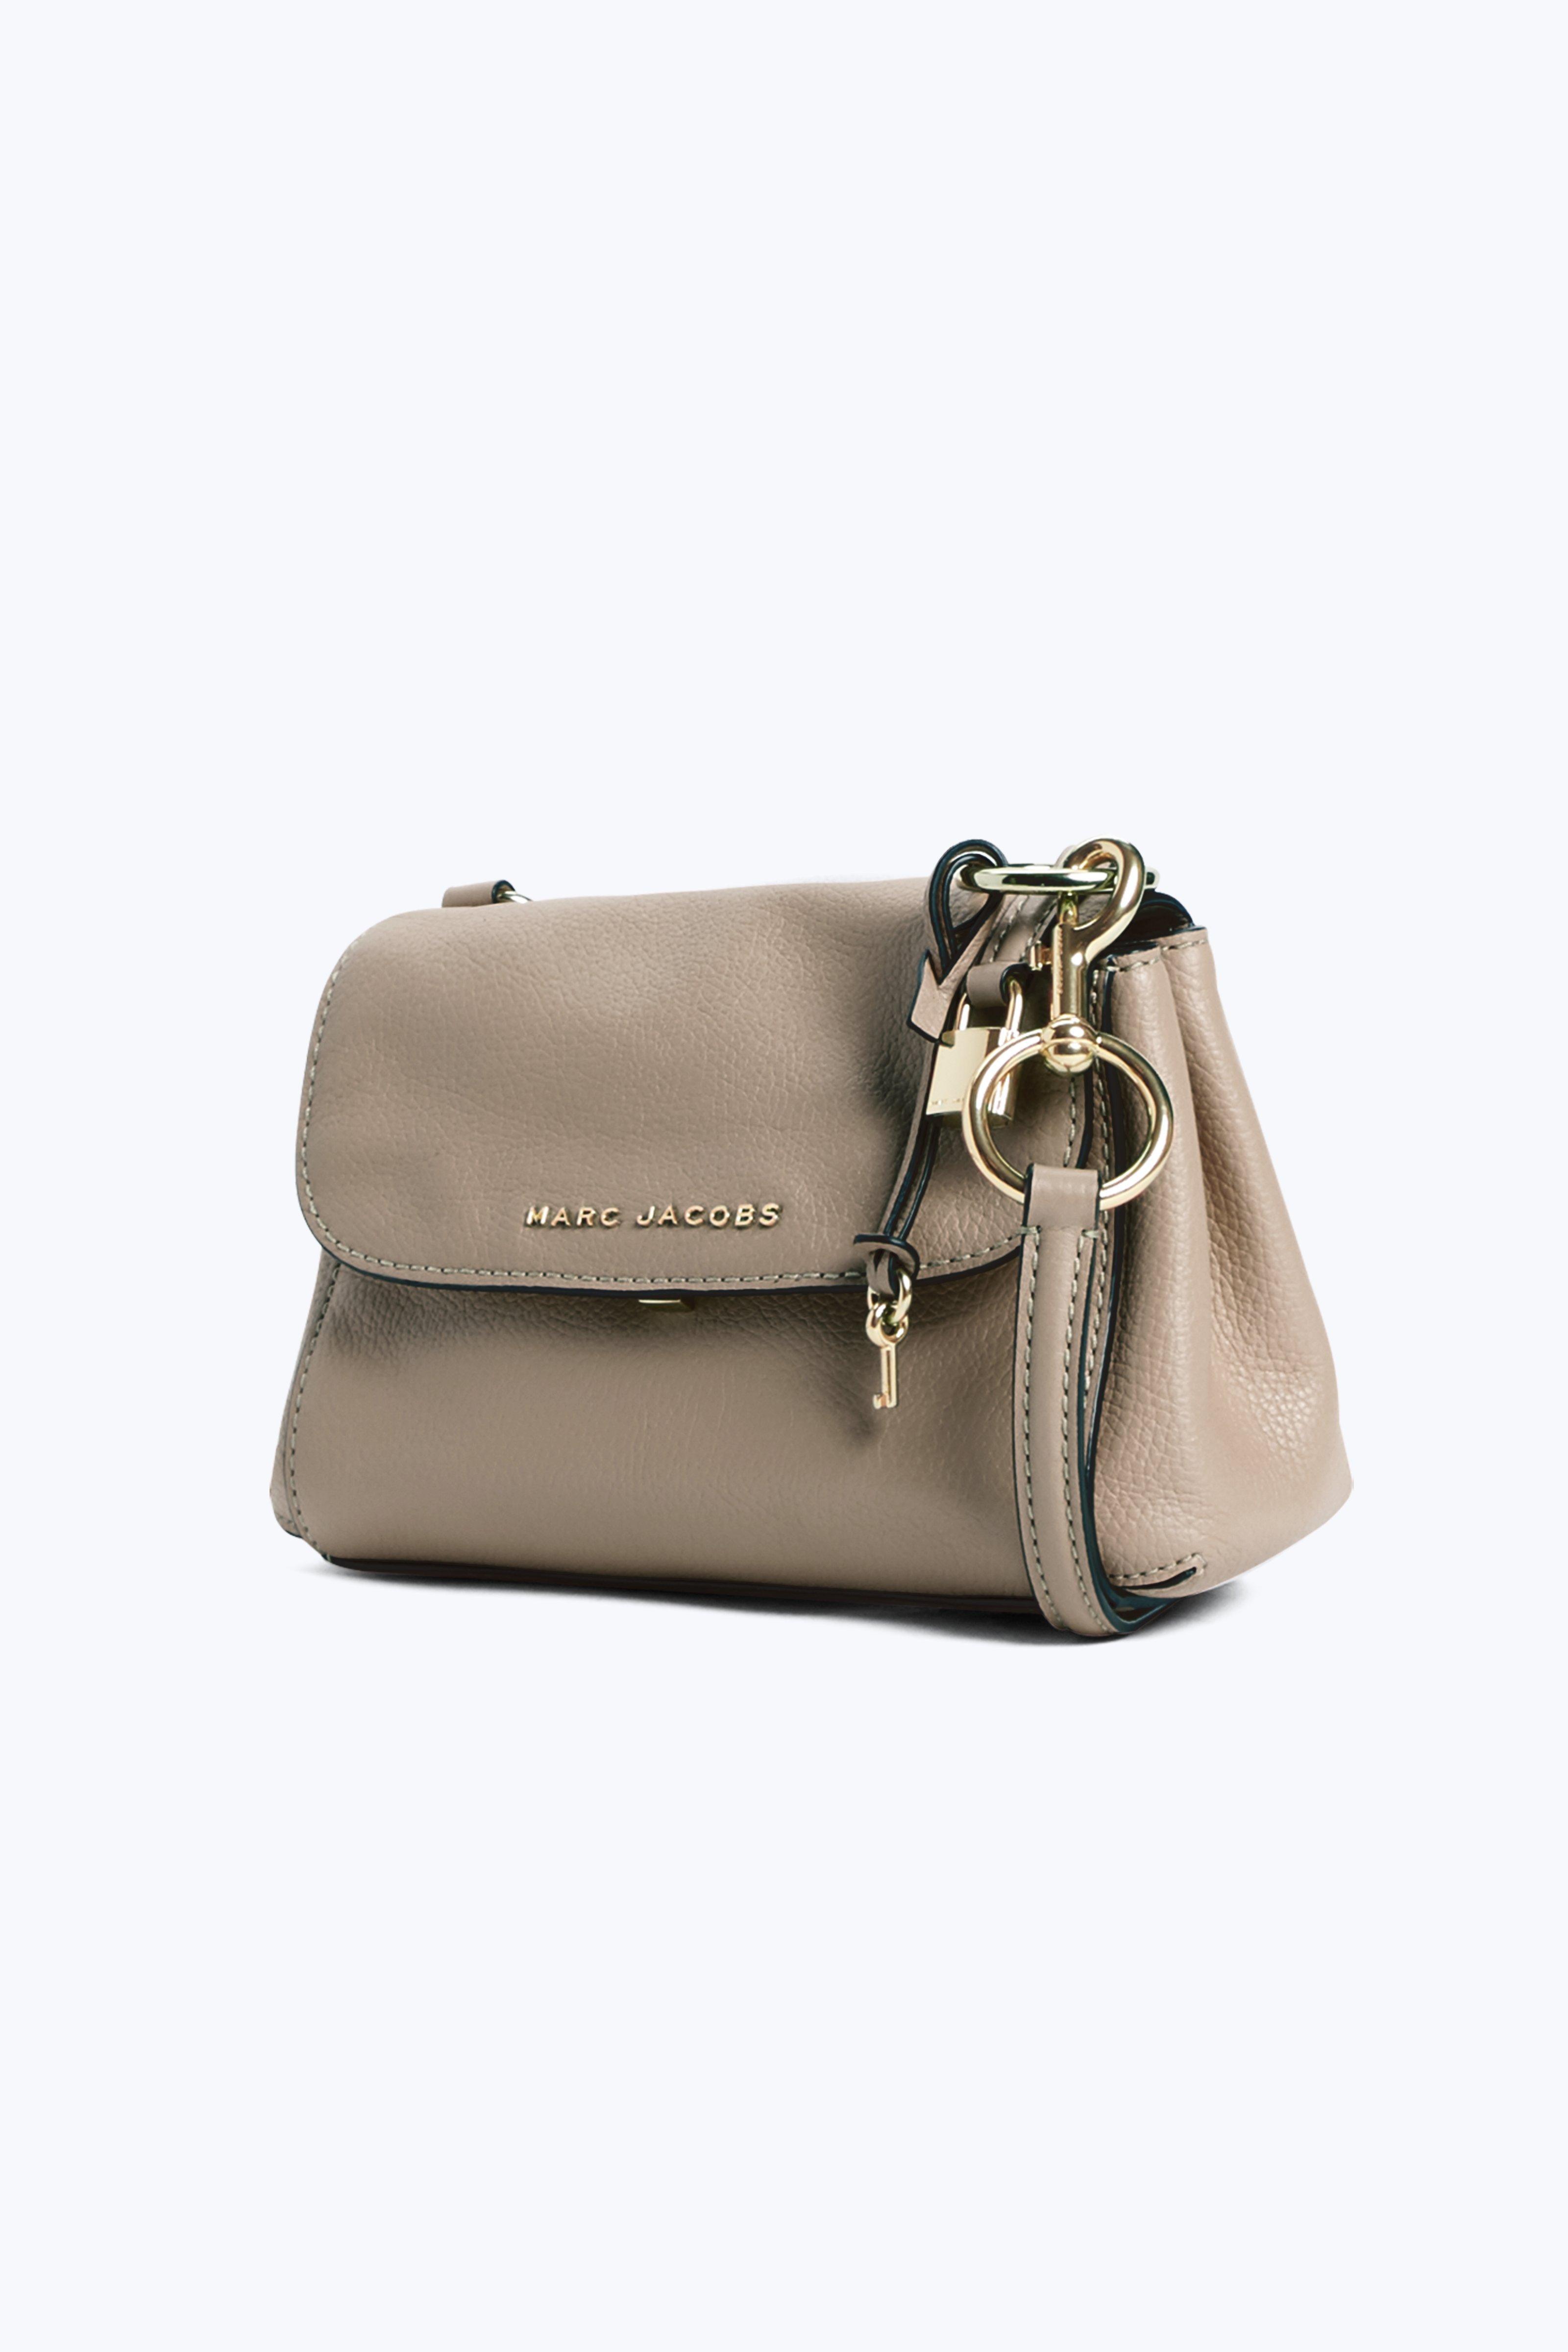 The Boho Grind Crossbody Bag in Light Slate Cow Leather Marc Jacobs 7ZiFvvRKc